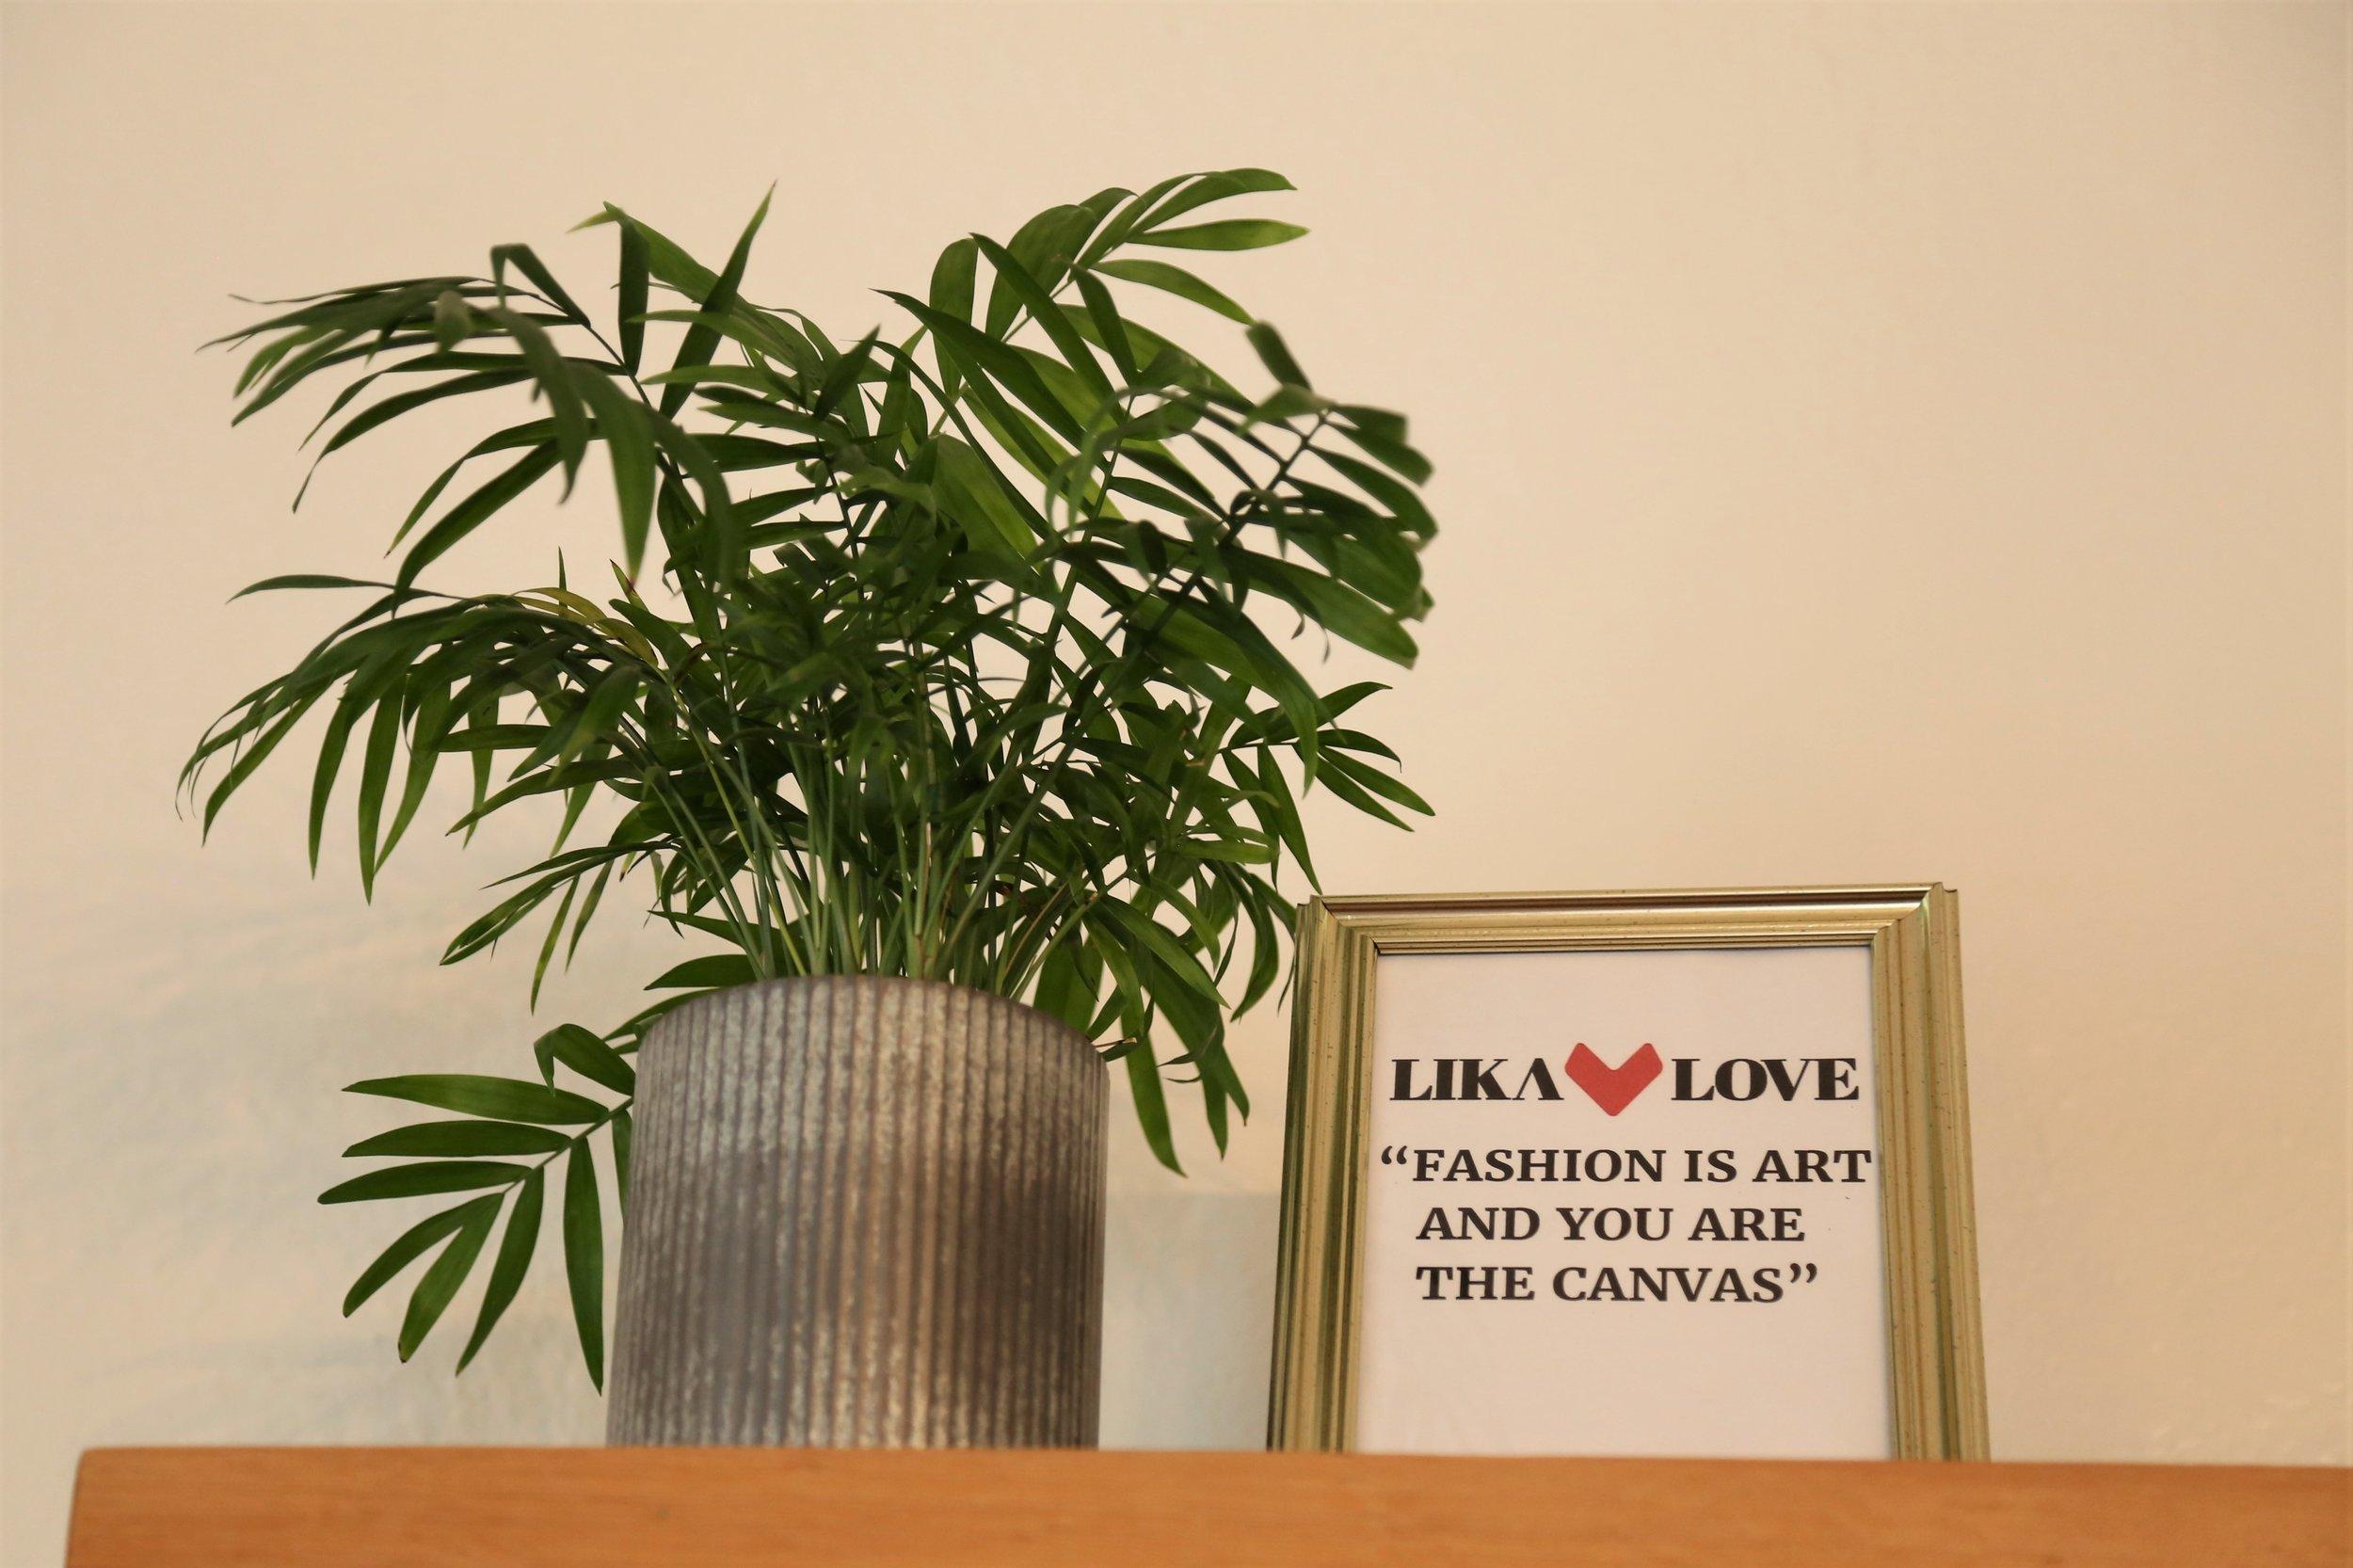 Lika Love